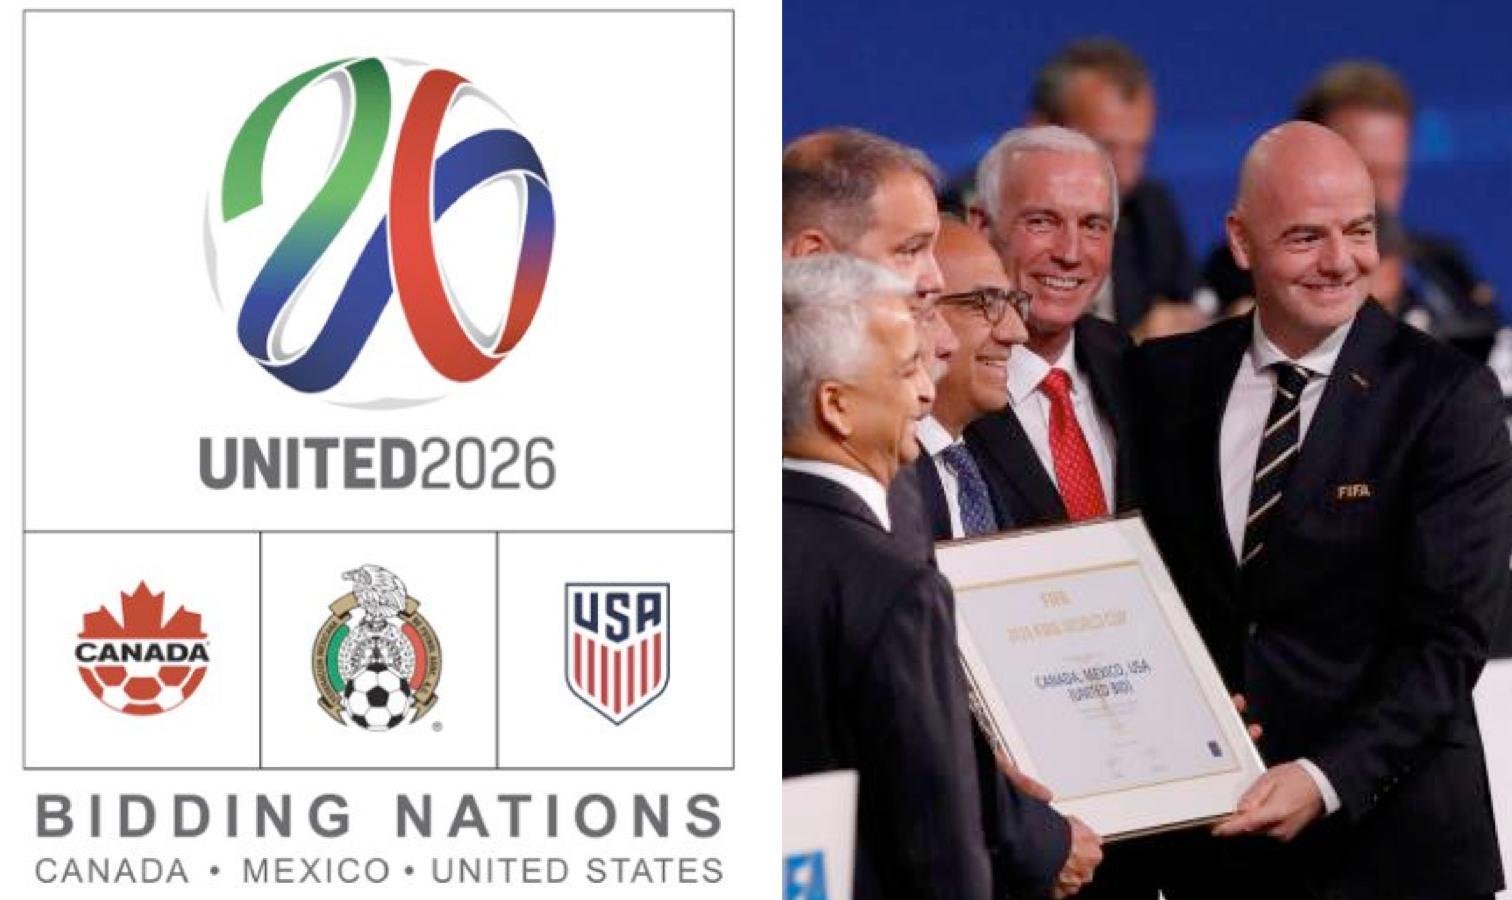 usa united cm 2026